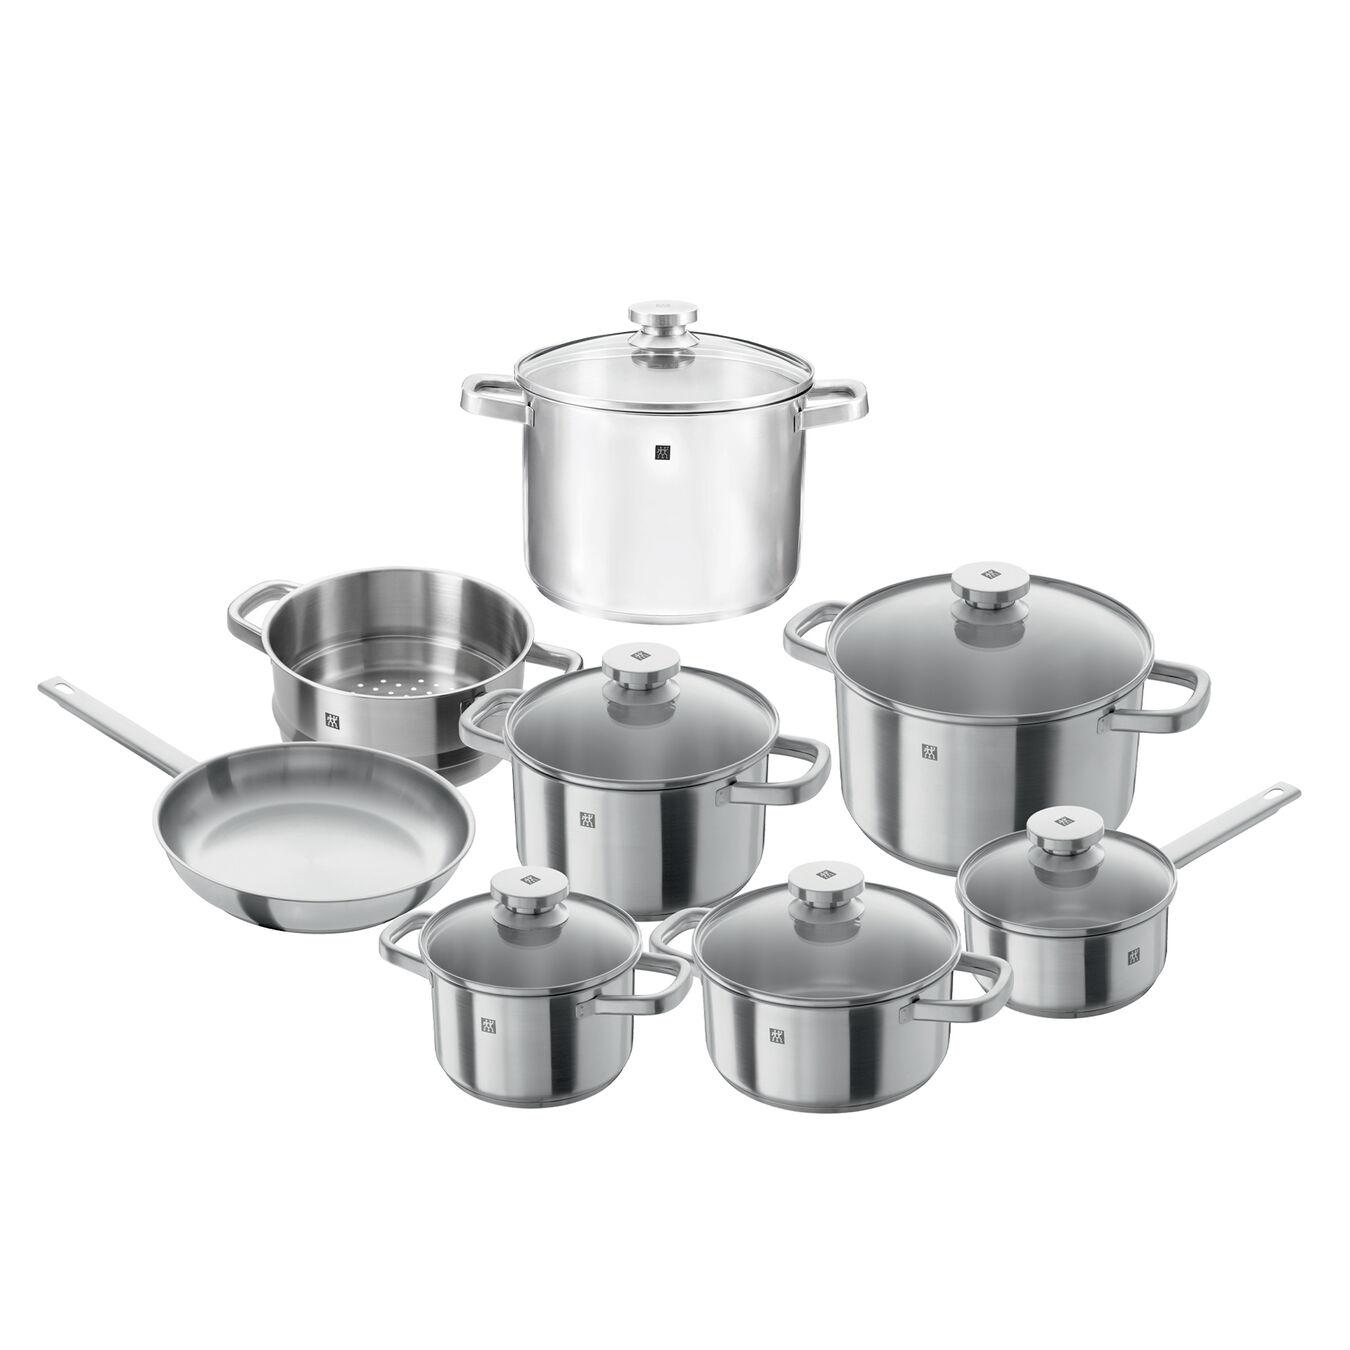 Bundle of Joy 14-Piece Cookware Set,,large 1